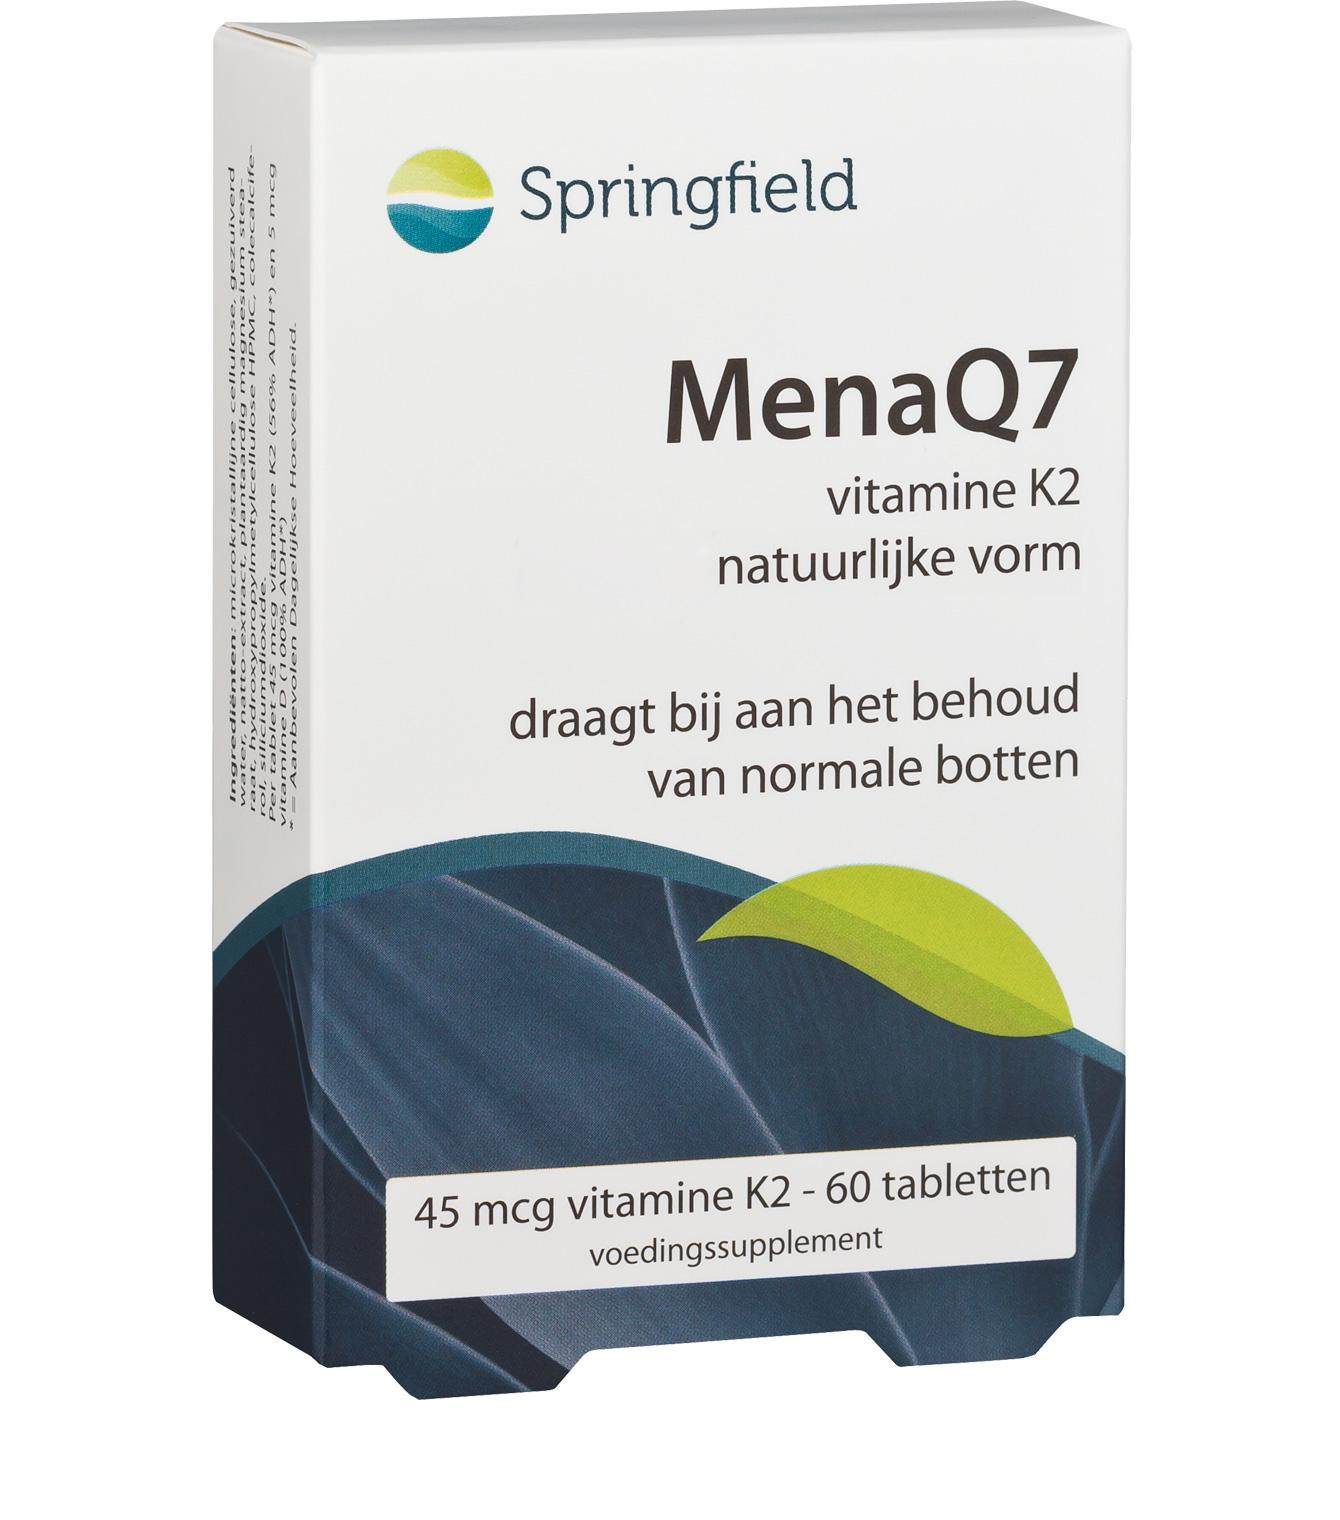 MenaQ7 vitamine K2 (menaquinone-7)